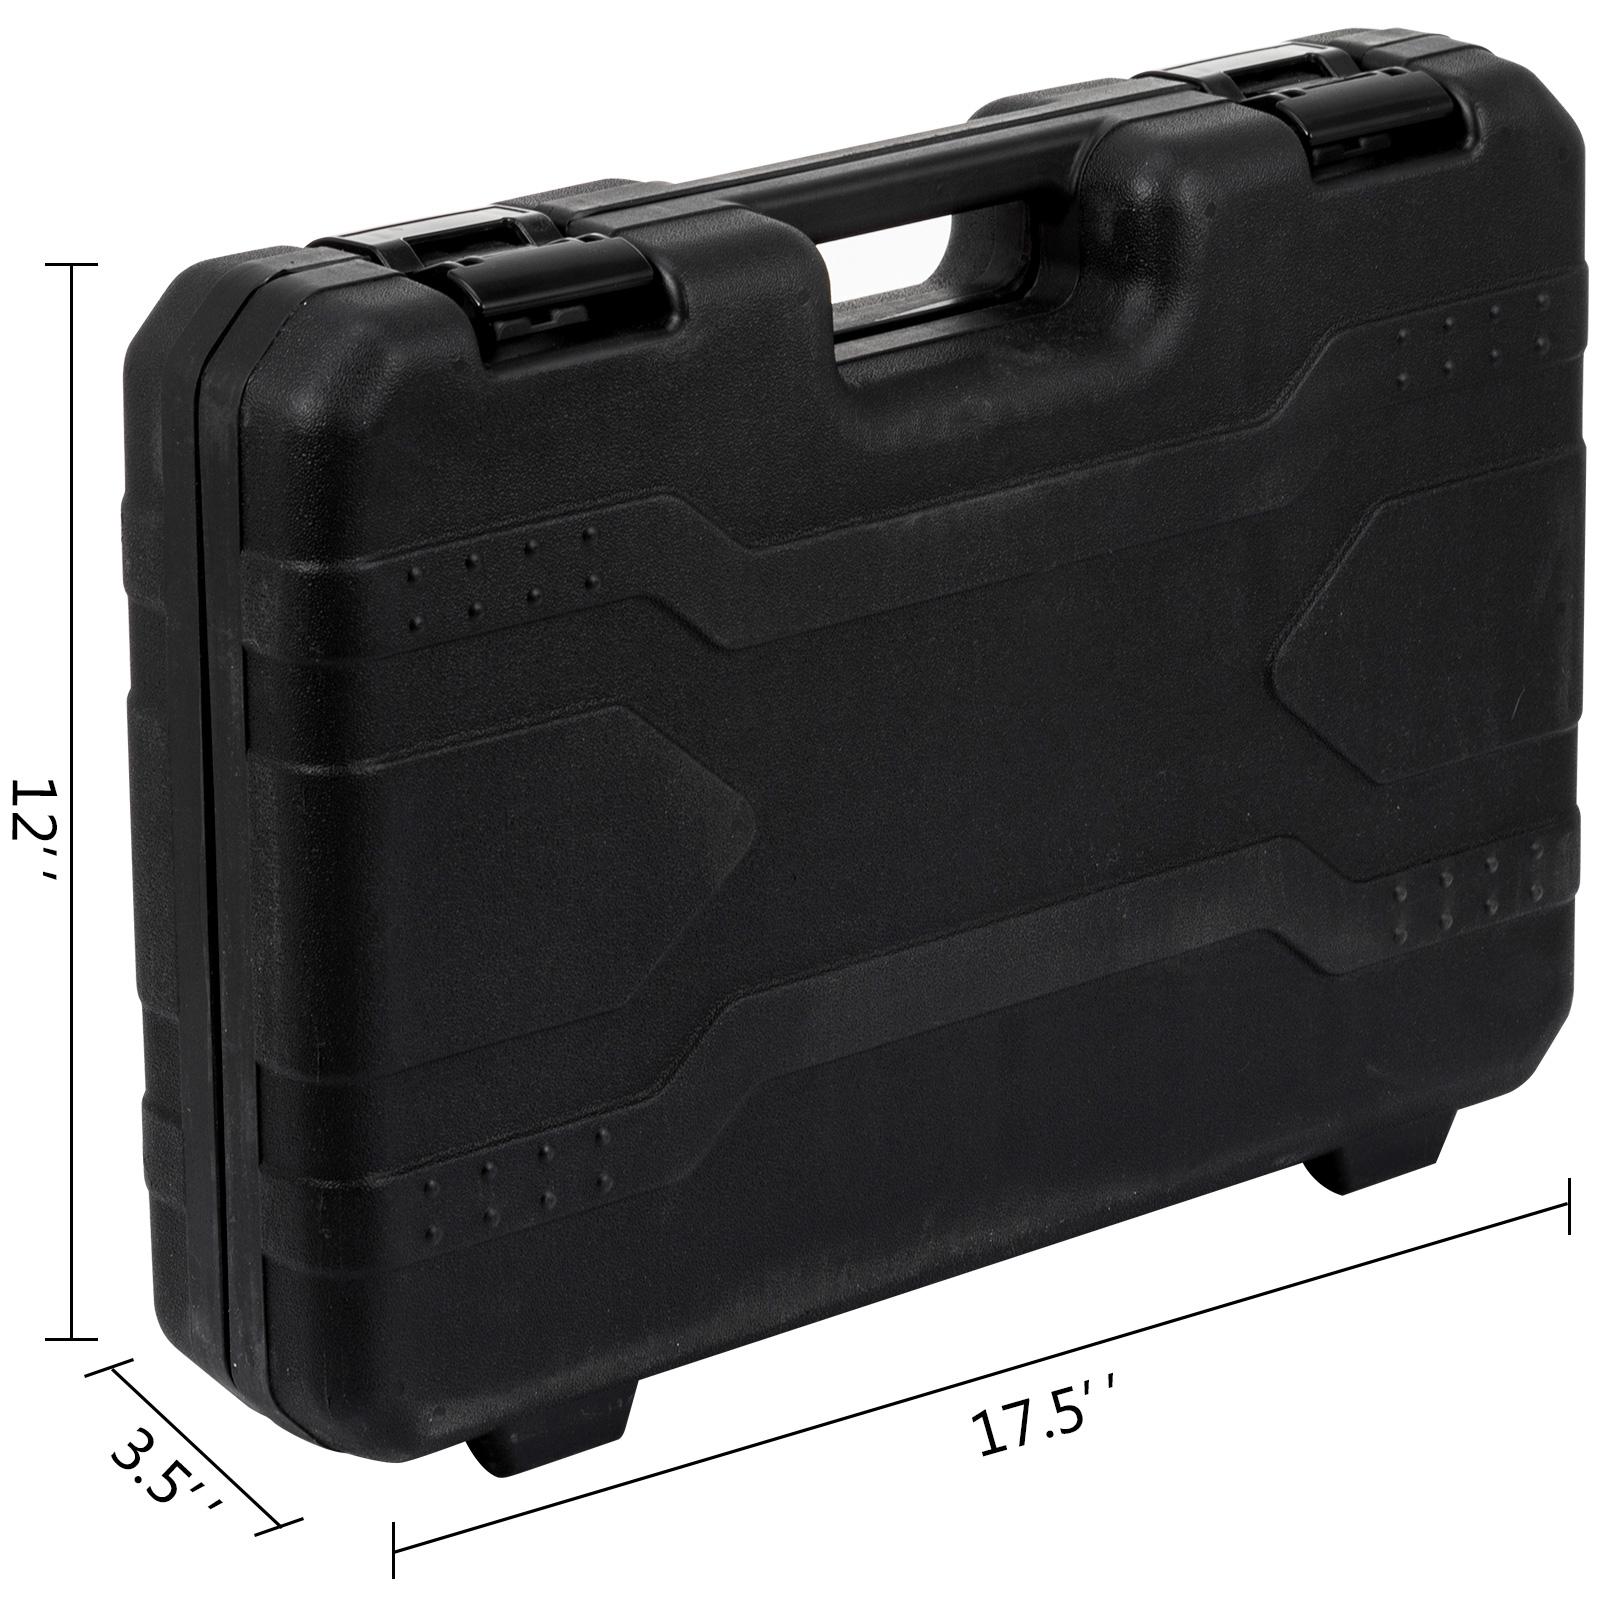 Hydraulic-A-C-Hose-Crimper-Tool-Kit-Hand-Tool-Crimping-Set-Hose-Fittings-7-Dies thumbnail 8